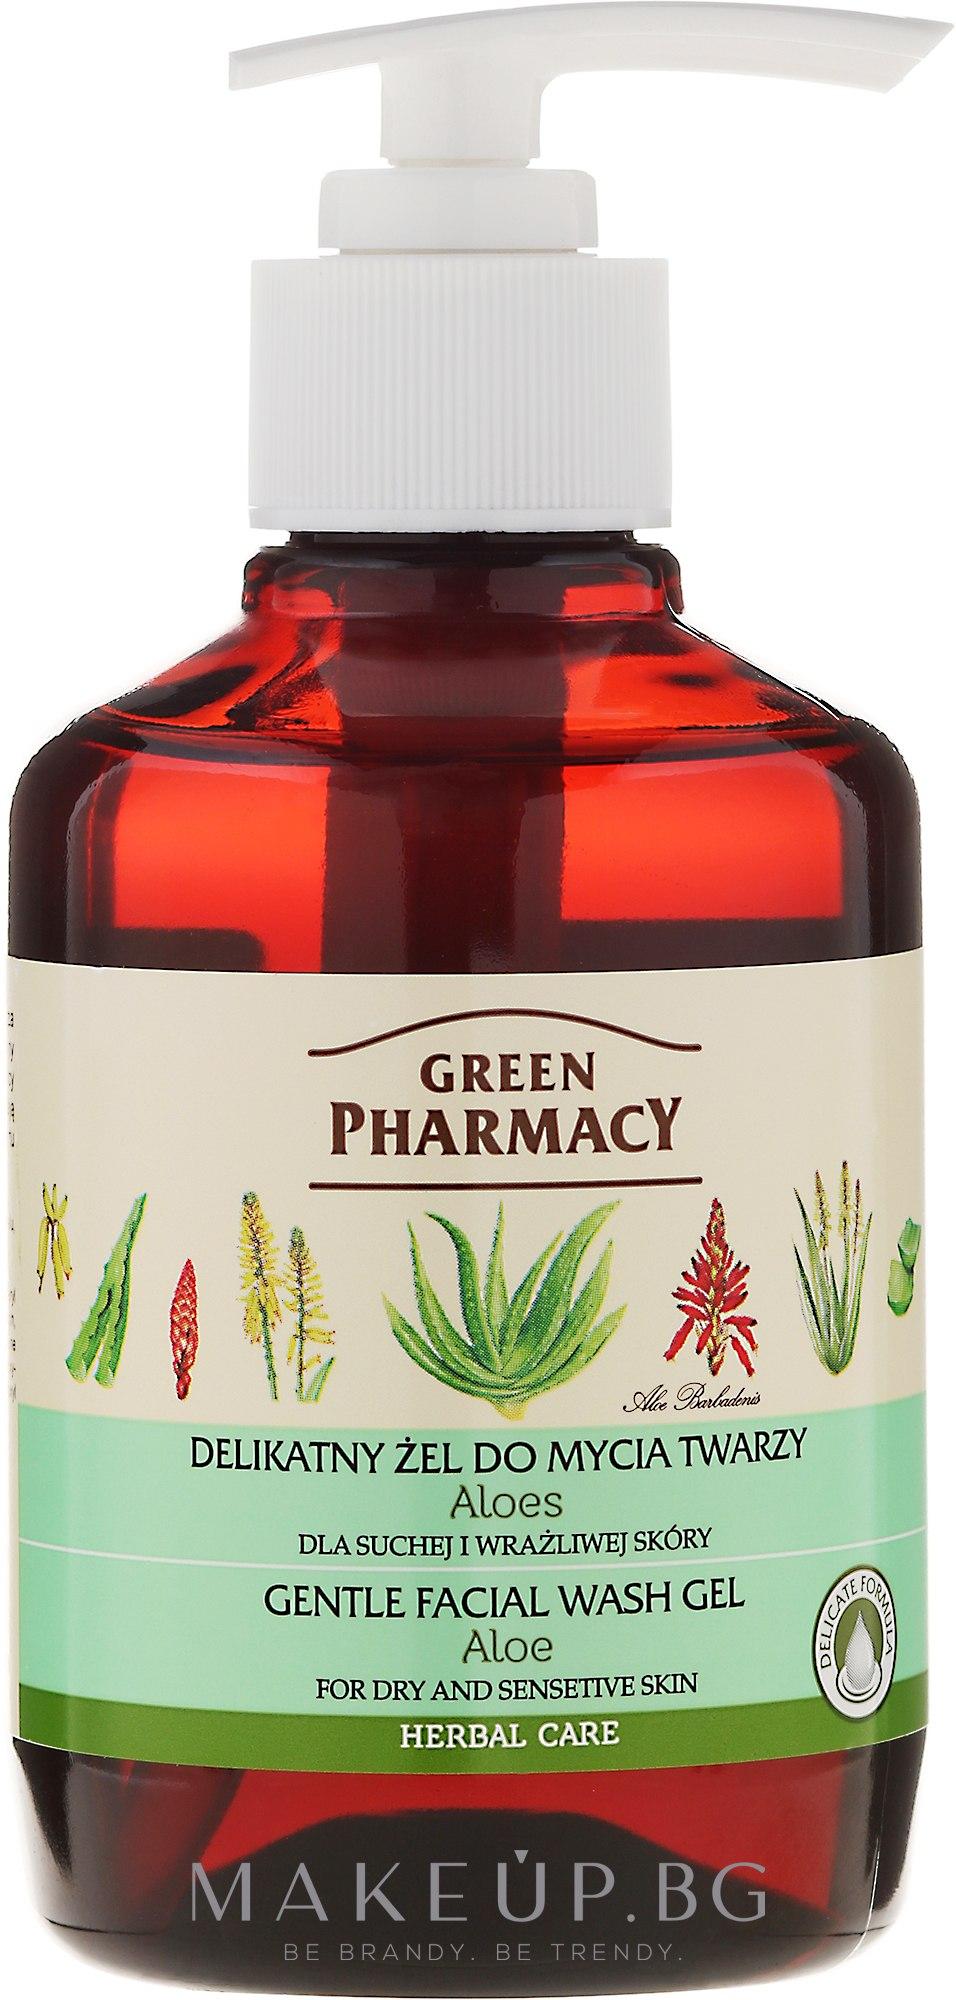 "Нежен измиващ гел за лице ""Алое"" - Green Pharmacy — снимка 270 ml"